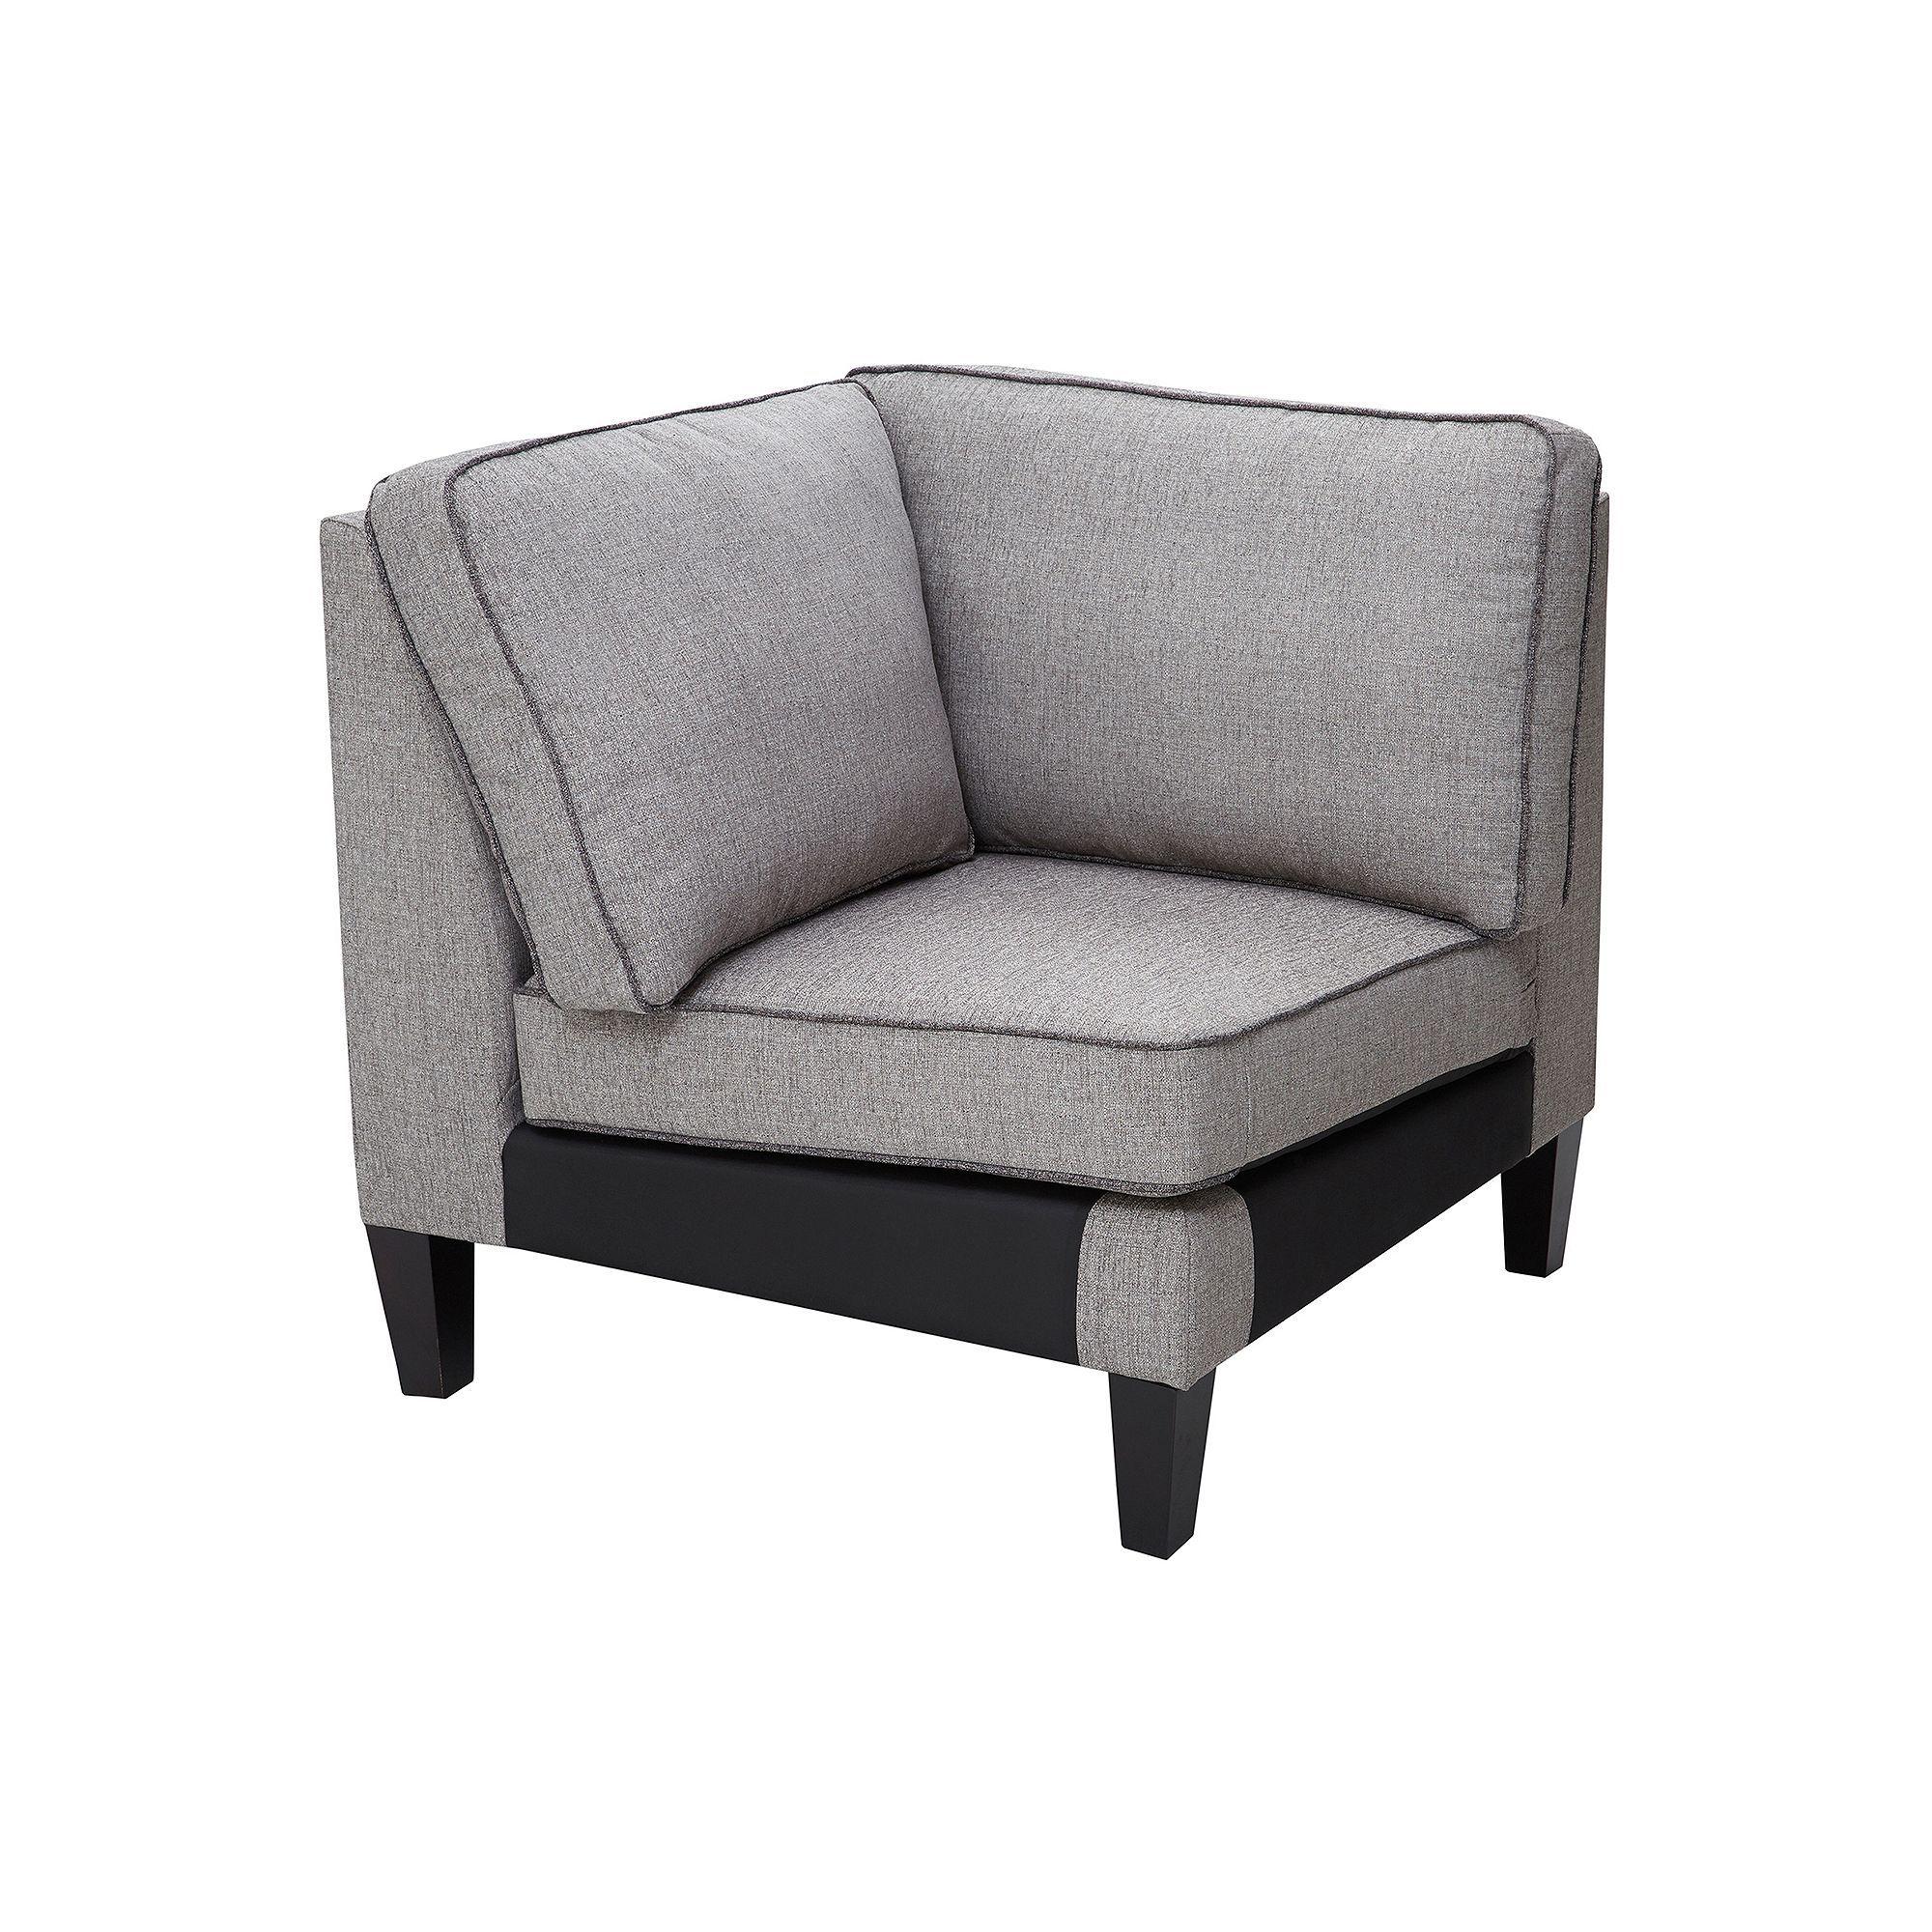 Madison park signature gordon modular corner sofa grey durable